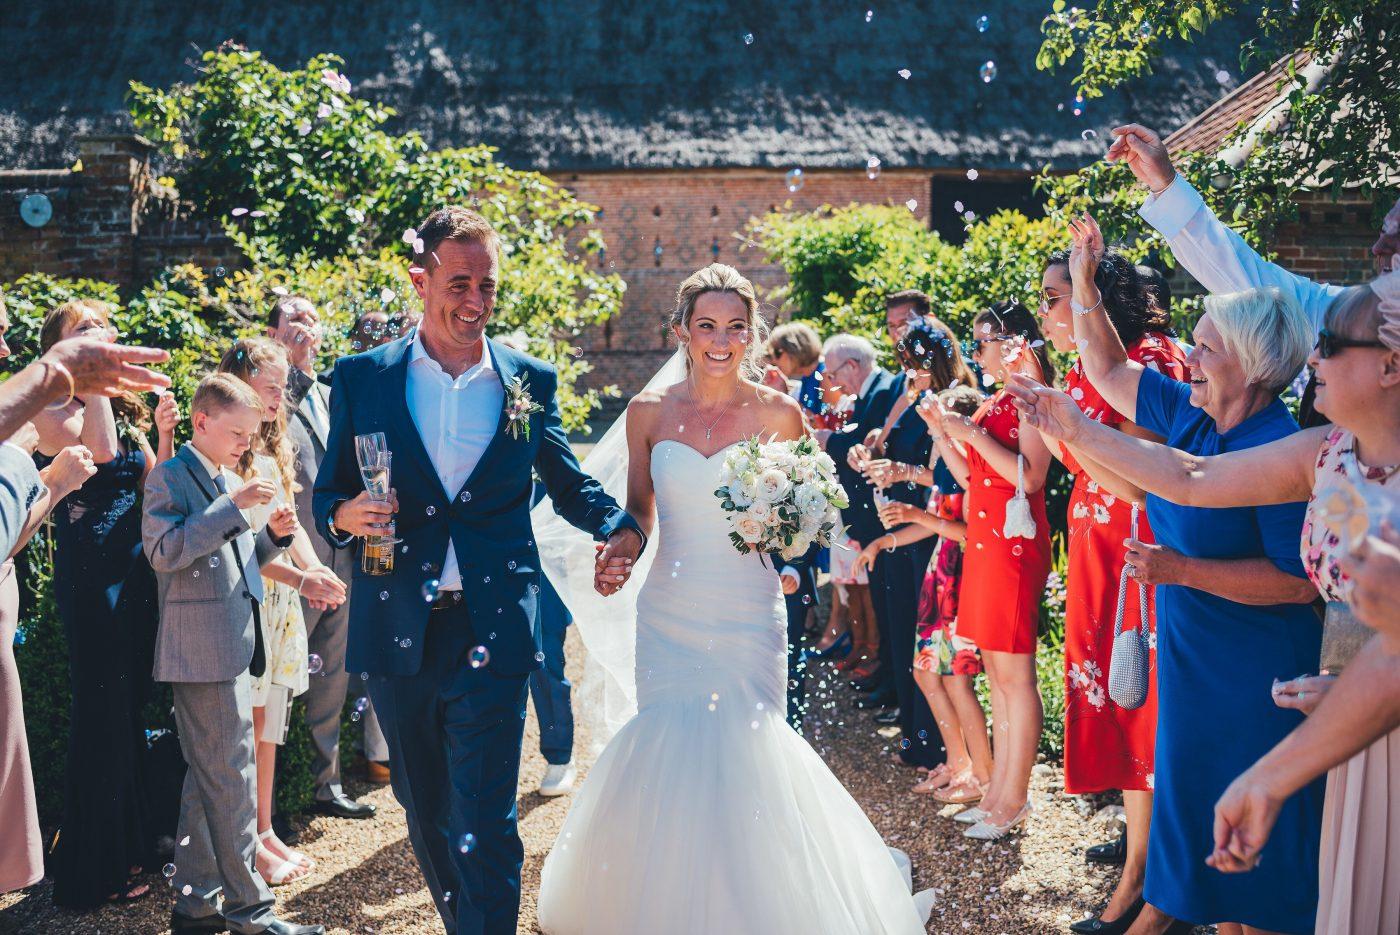 Hales Hall & The Great Barn Wedding Venue